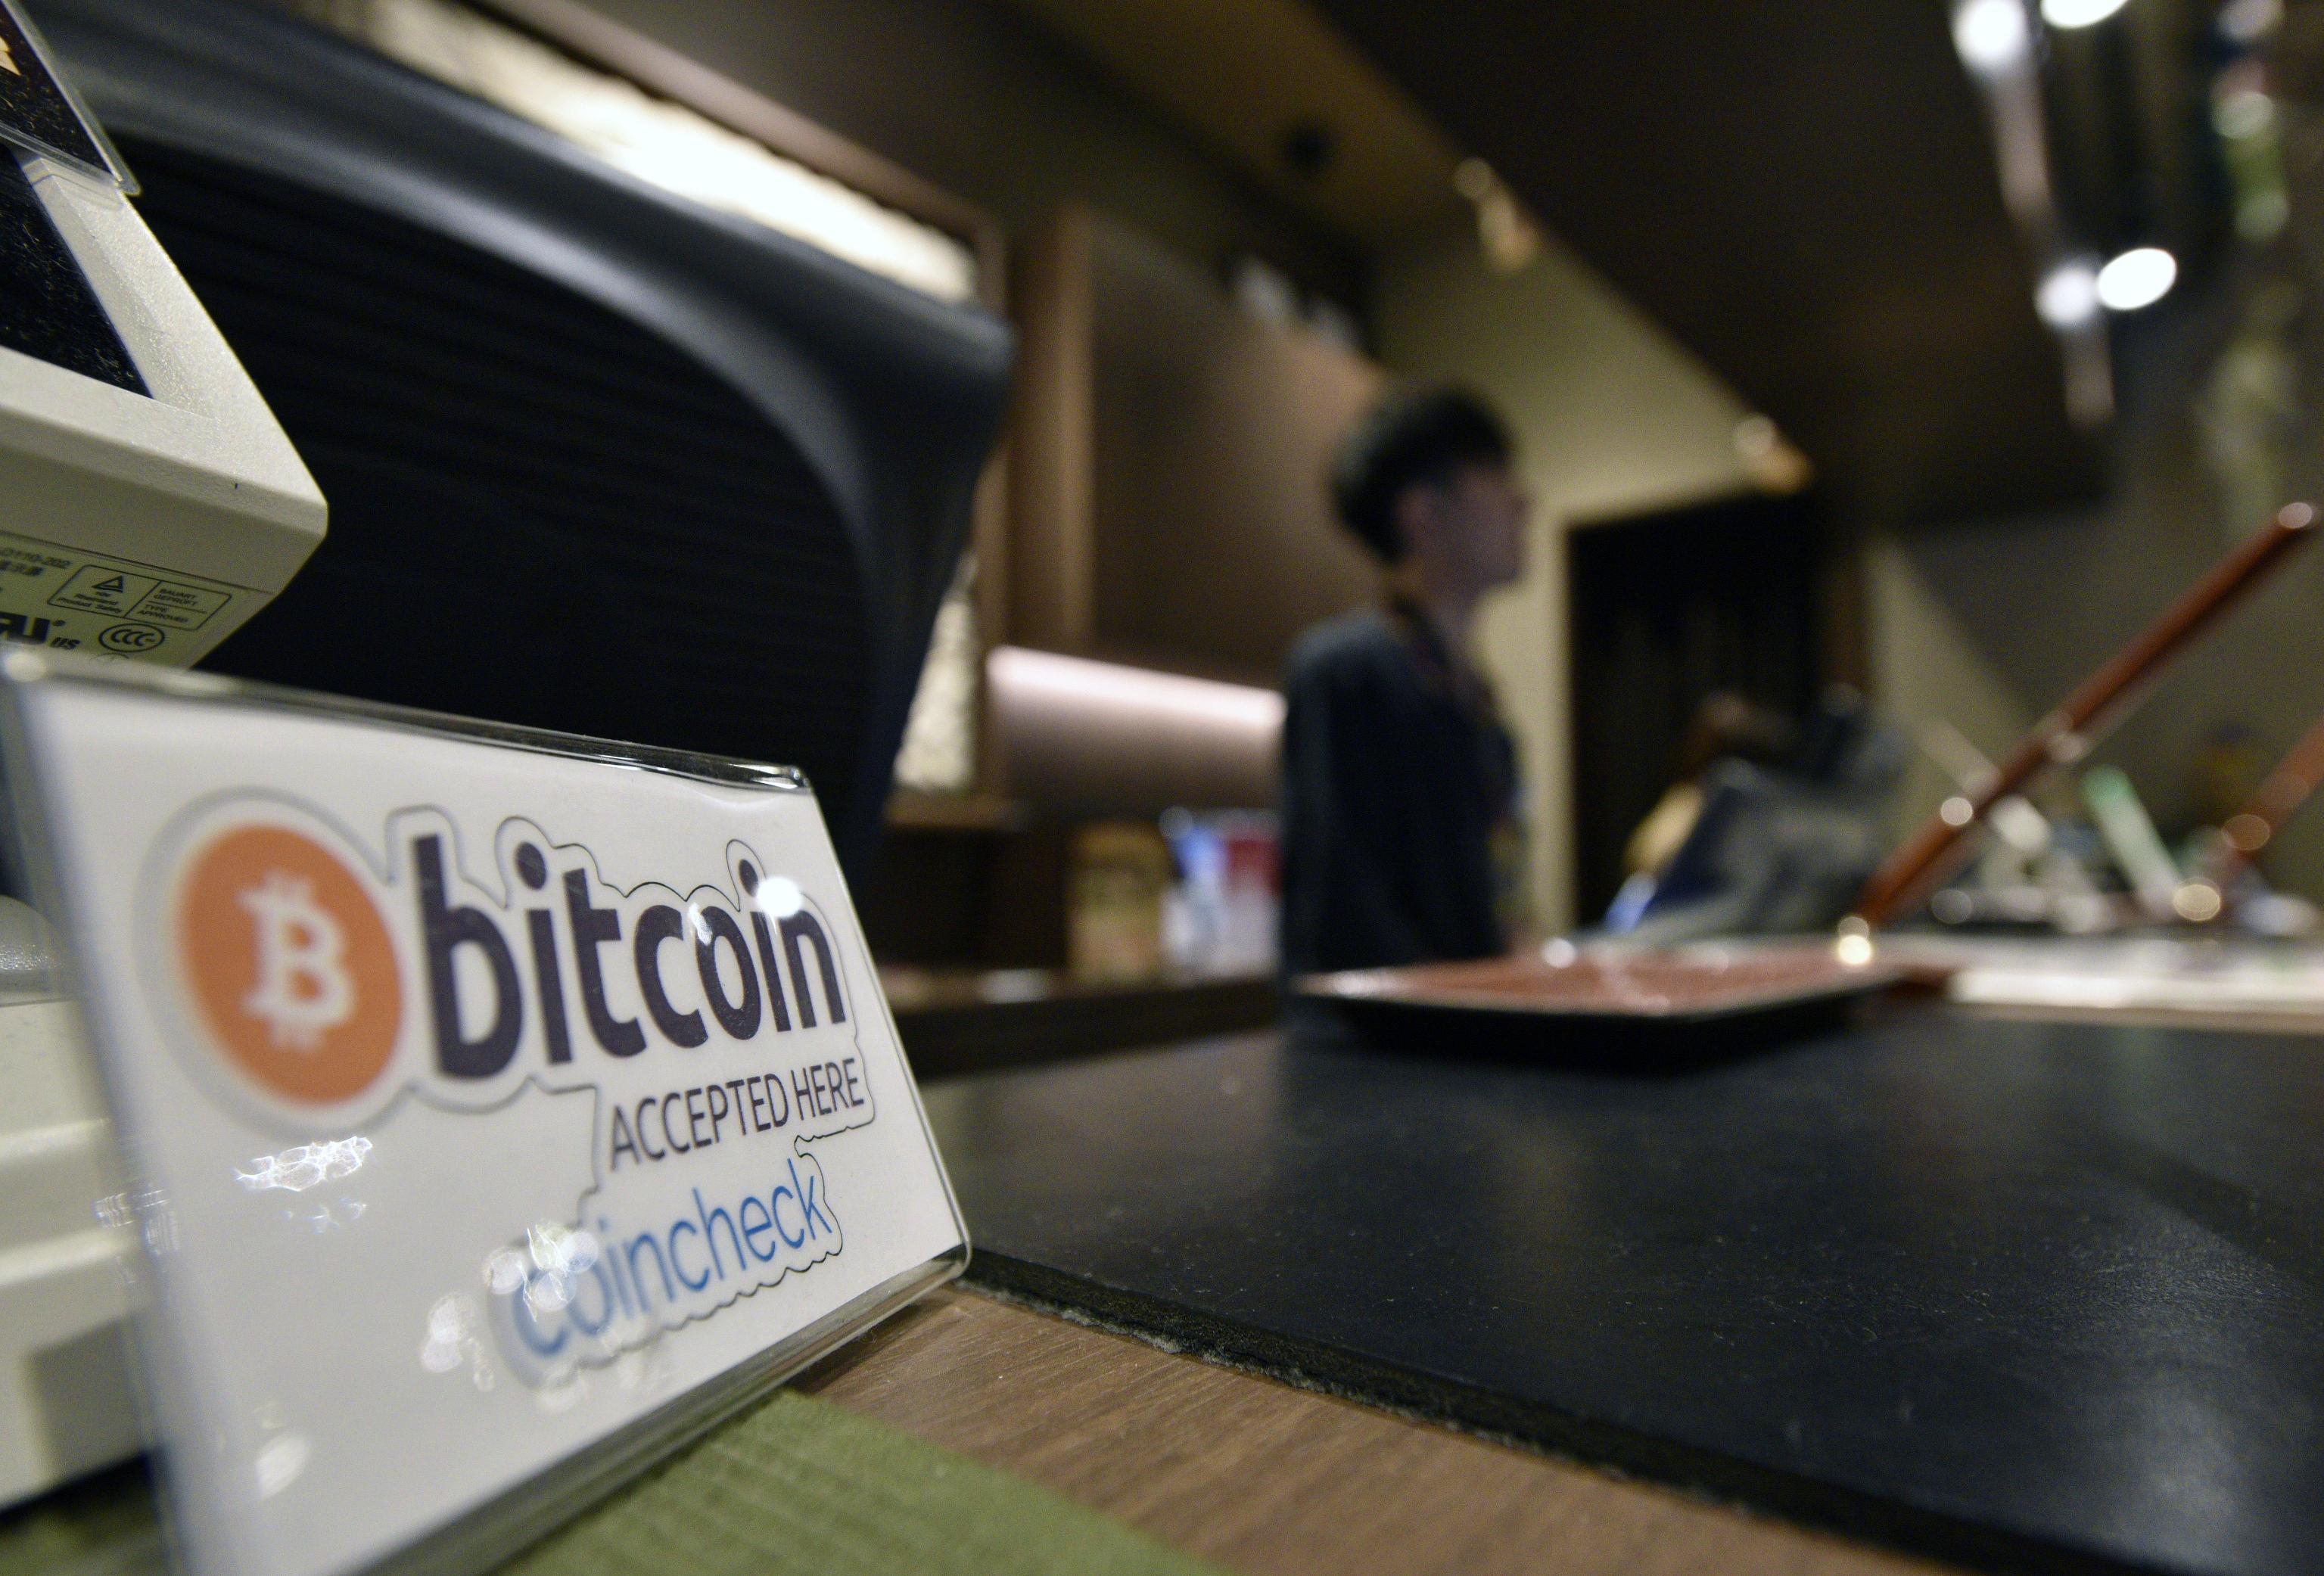 Turchia: 'Bitcoin contrario all'Islam'